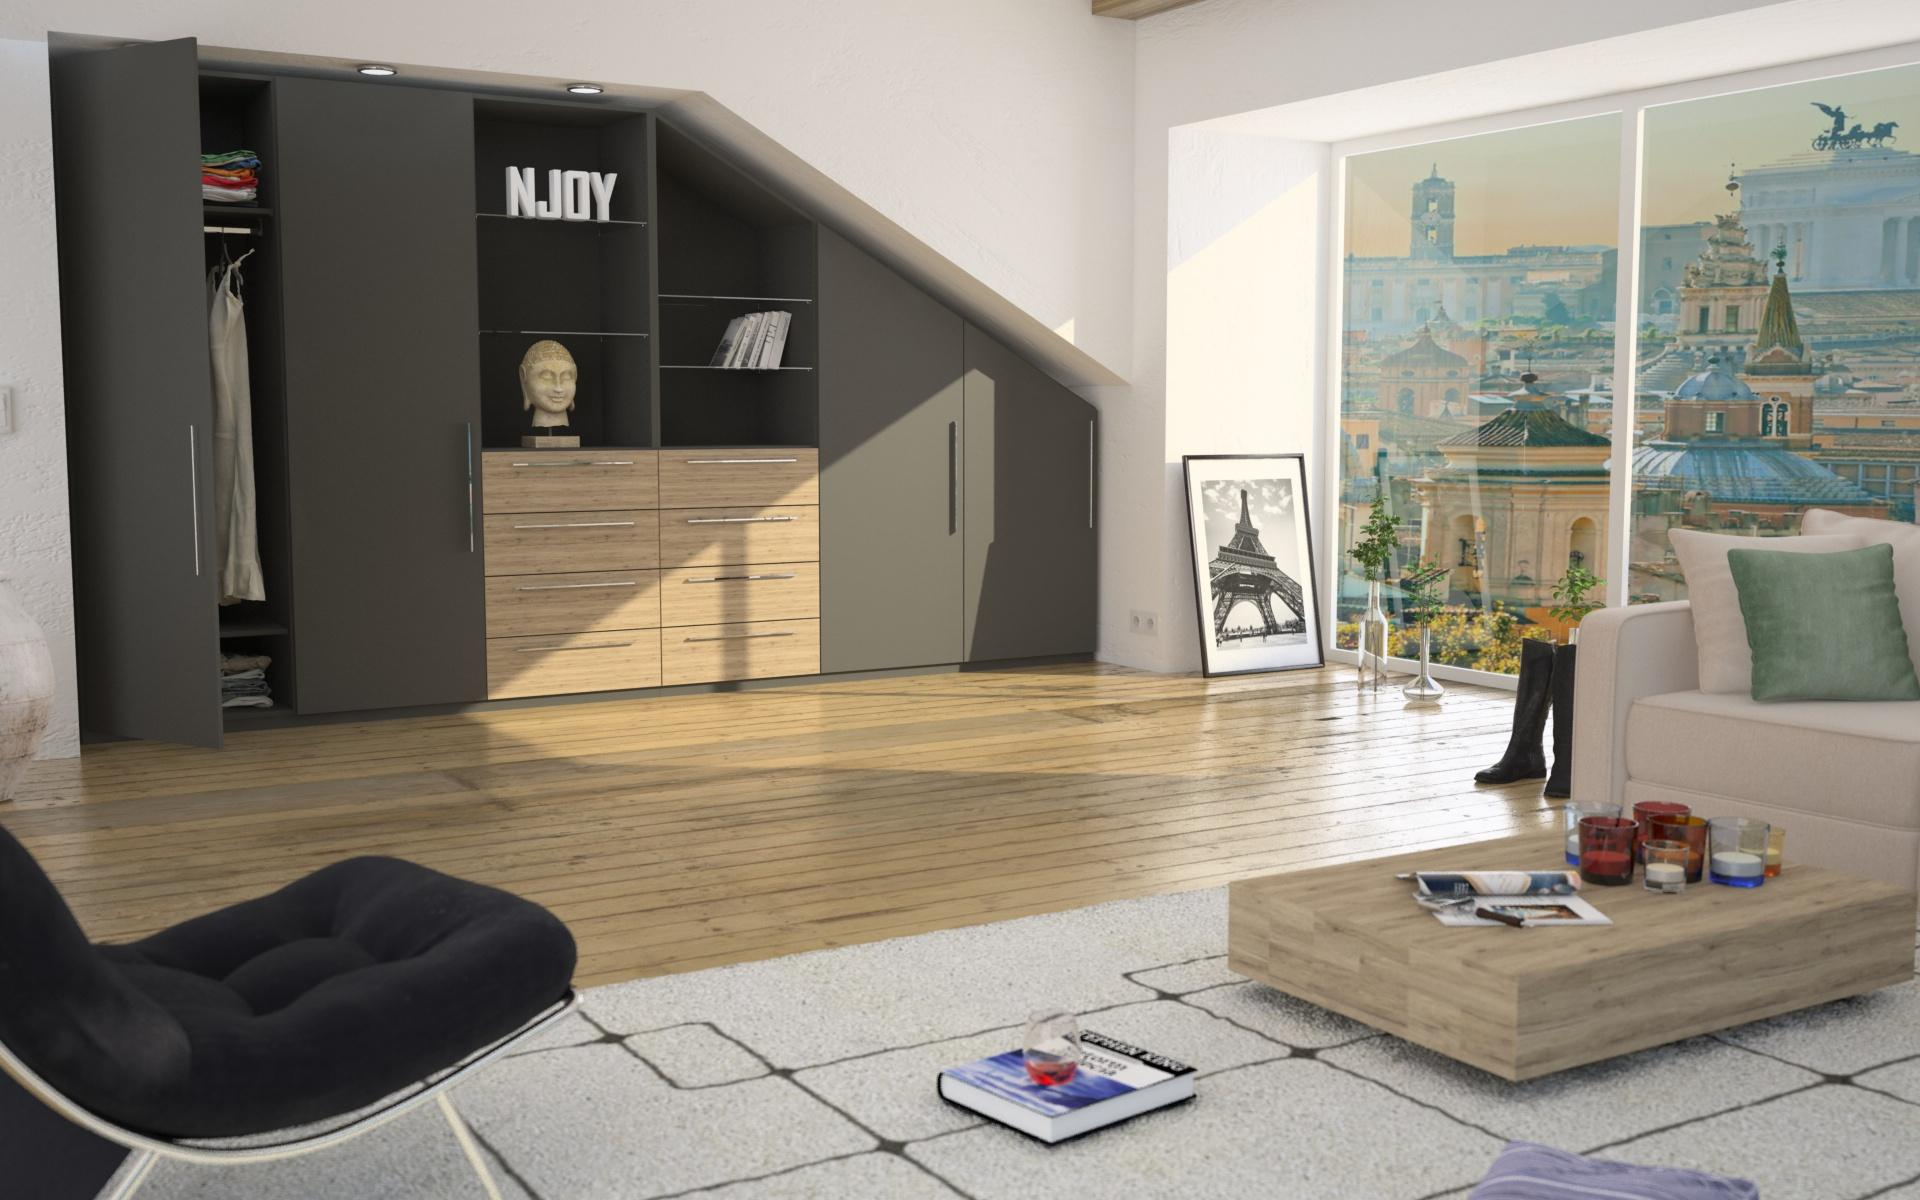 dunkle r ume bilder ideen couchstyle. Black Bedroom Furniture Sets. Home Design Ideas